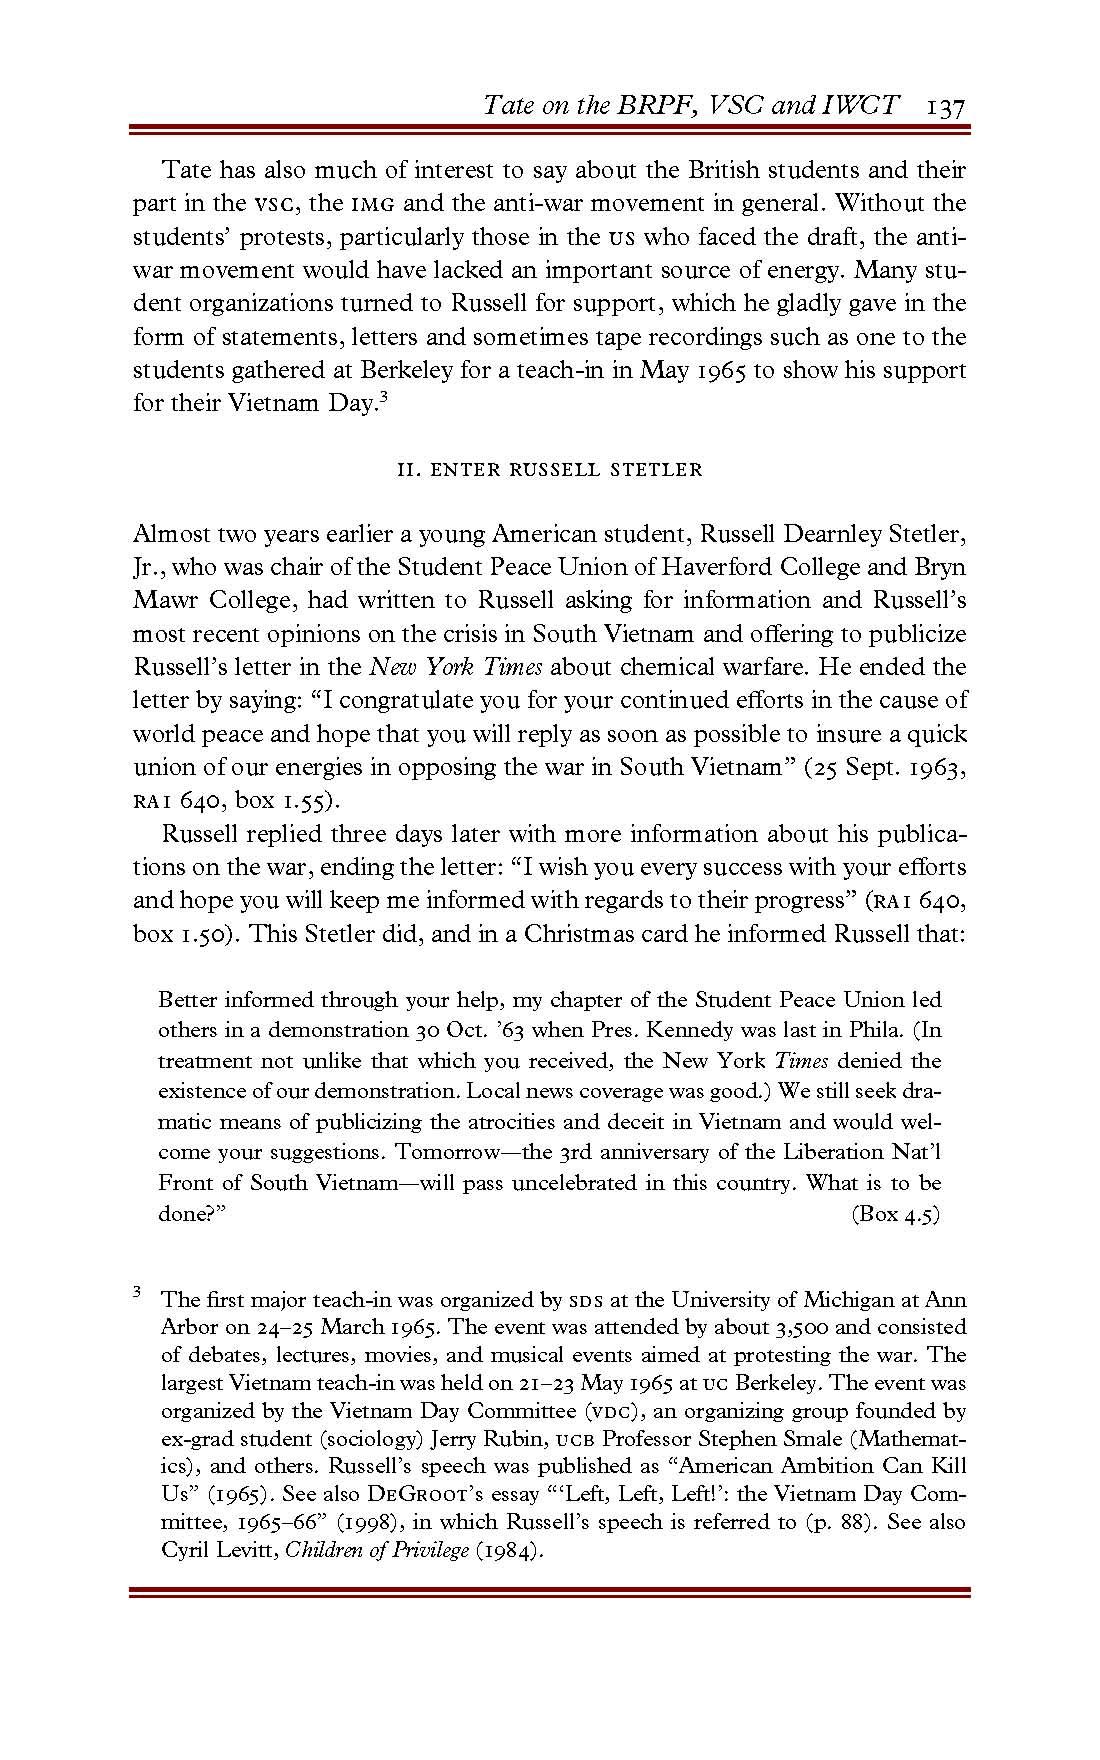 5 paragraph essay on salem witch trials